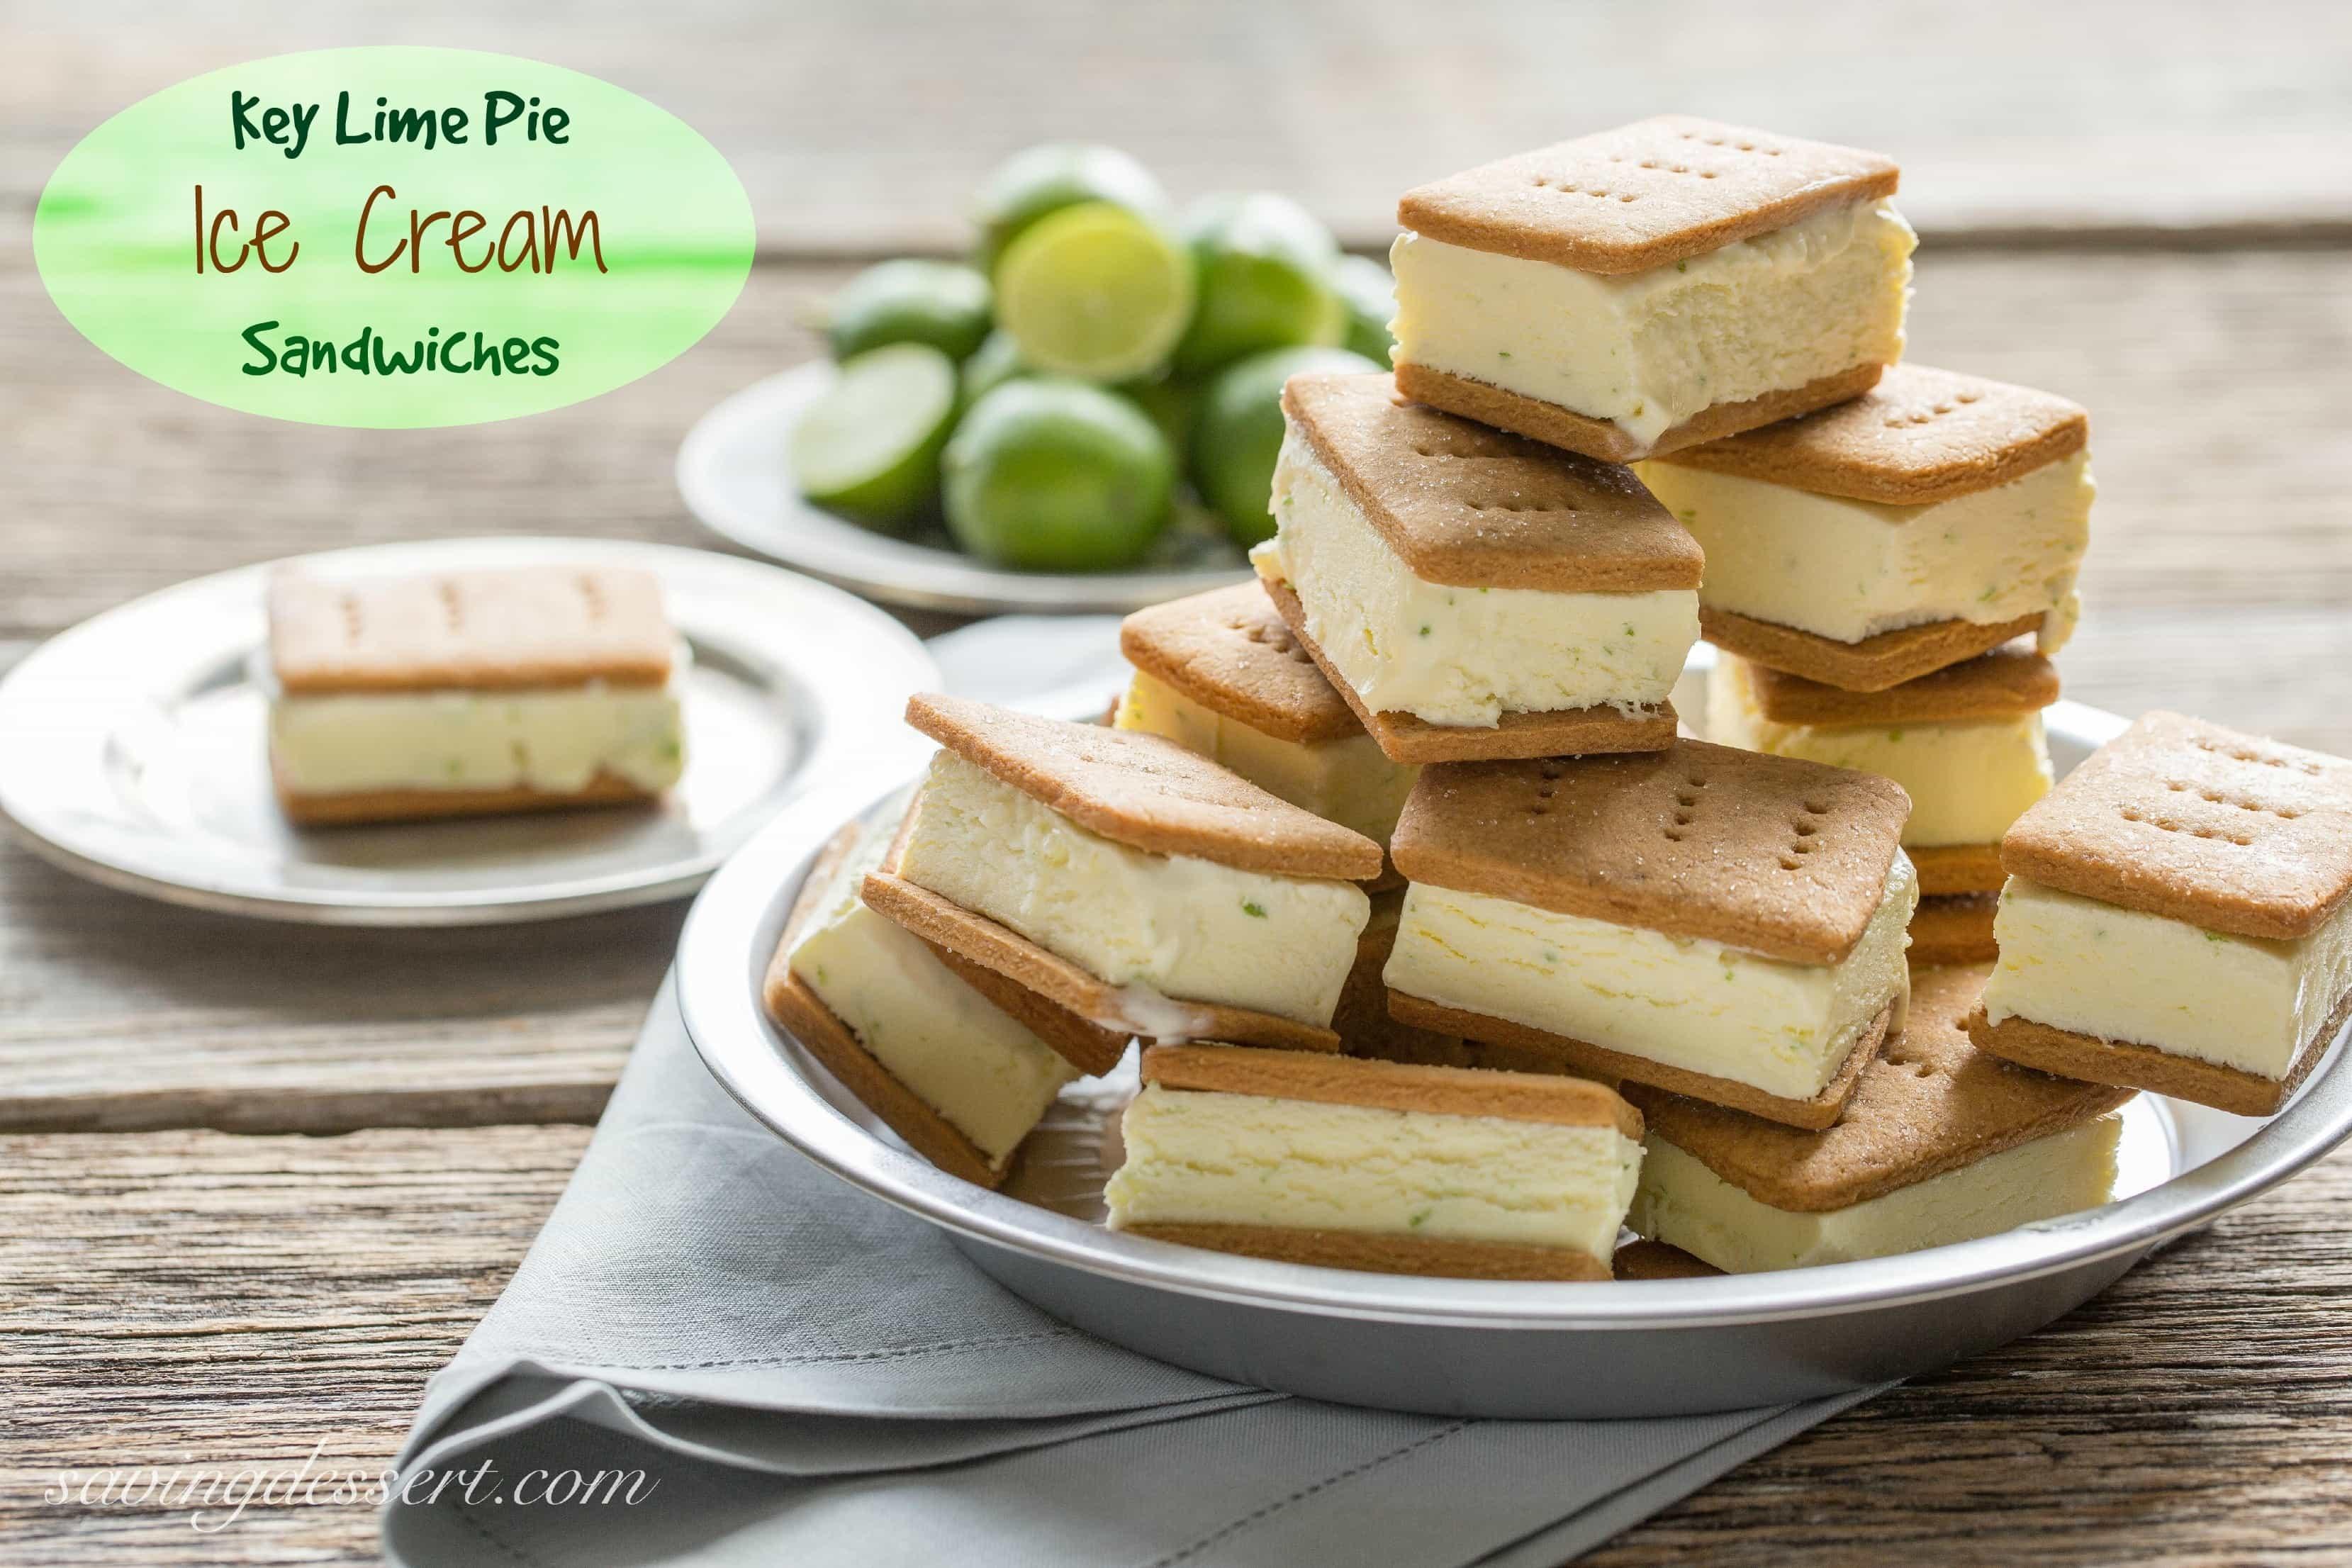 Key Lime Pie ~ Ice Cream Sandwiches